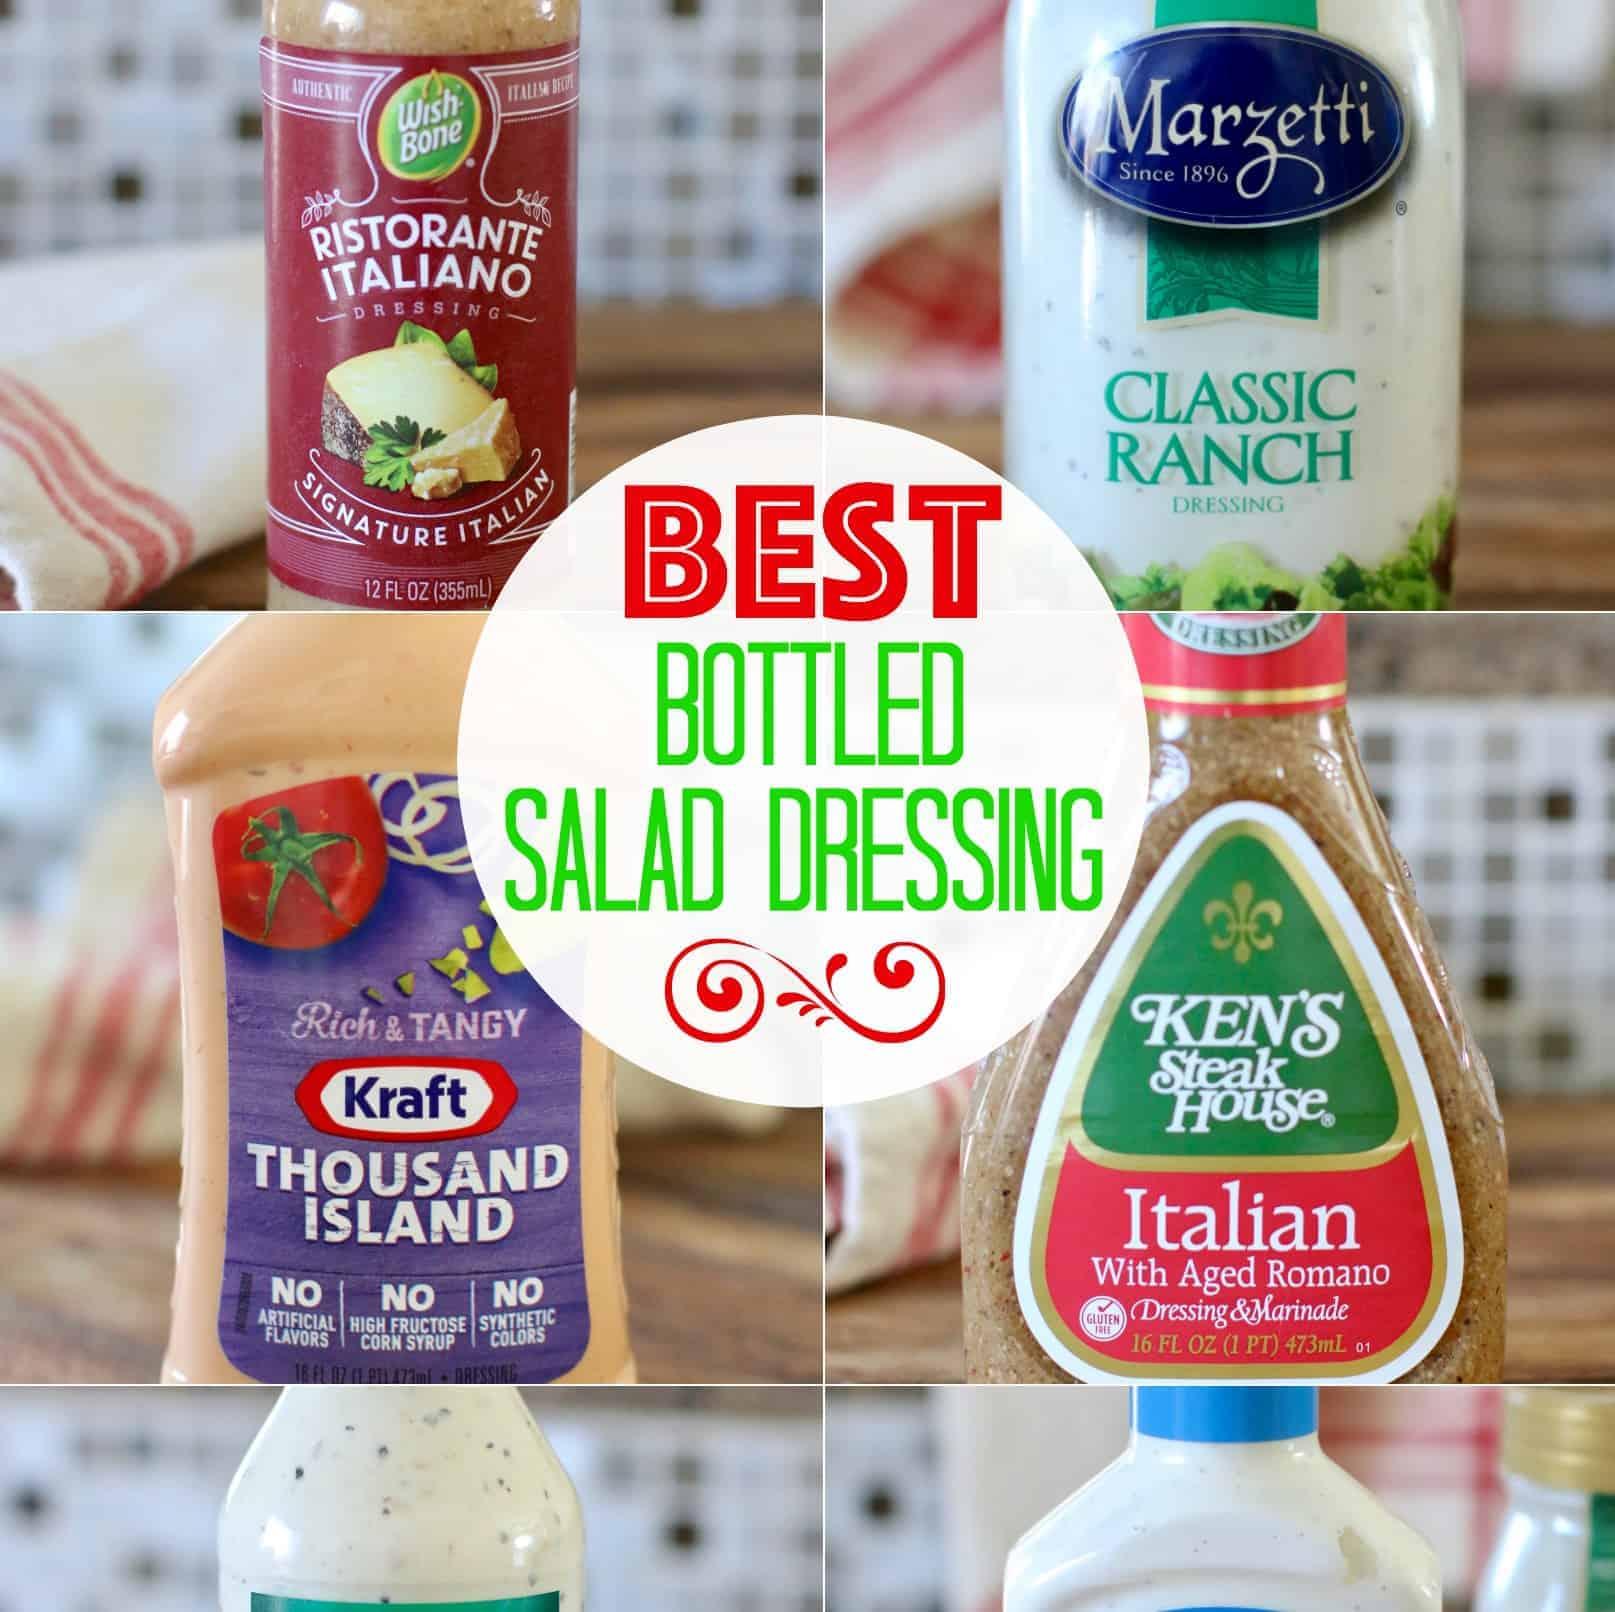 The Best Bottled Salad Dressing | The